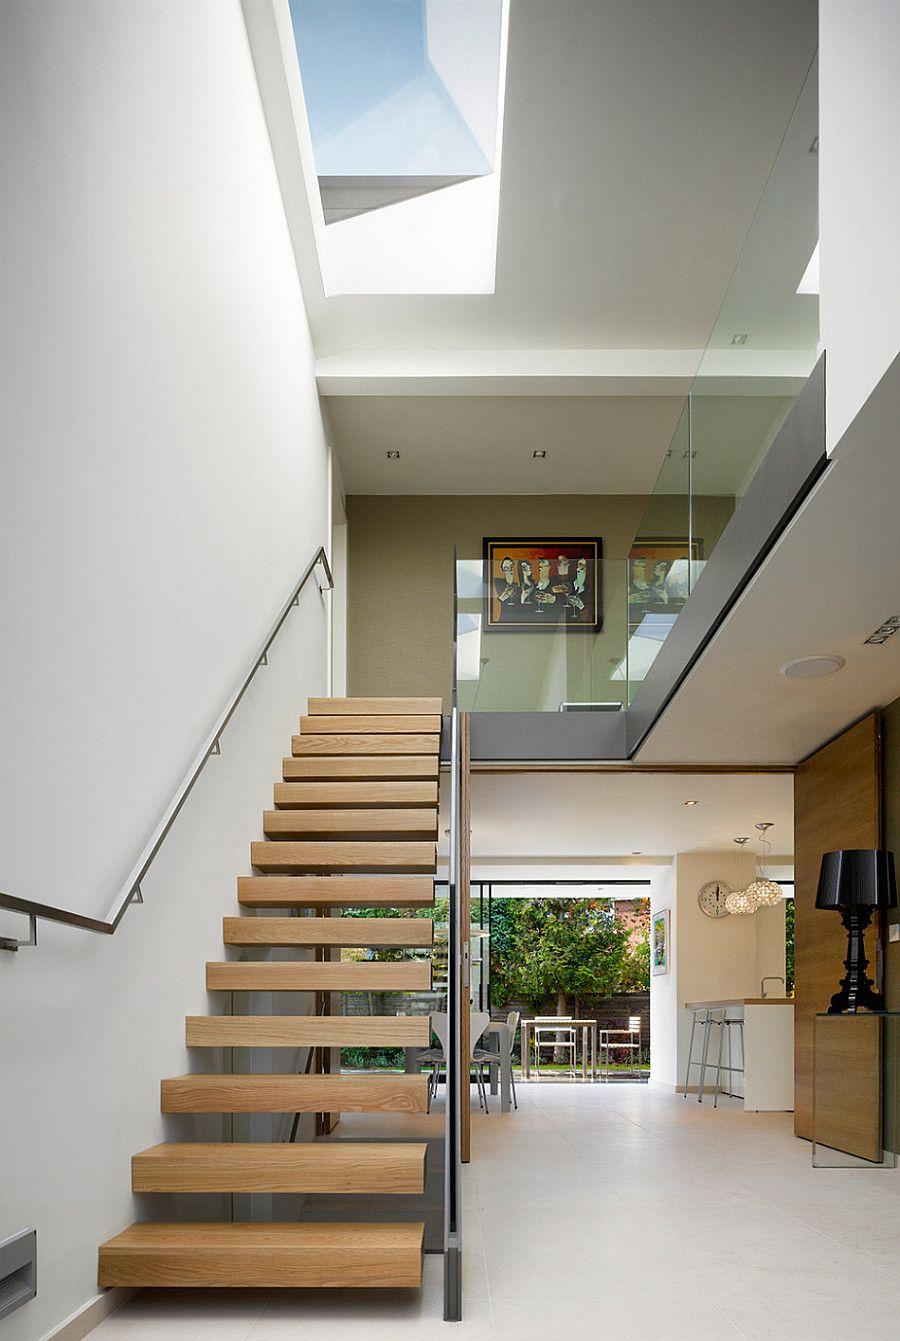 фото загородного дома - лестница